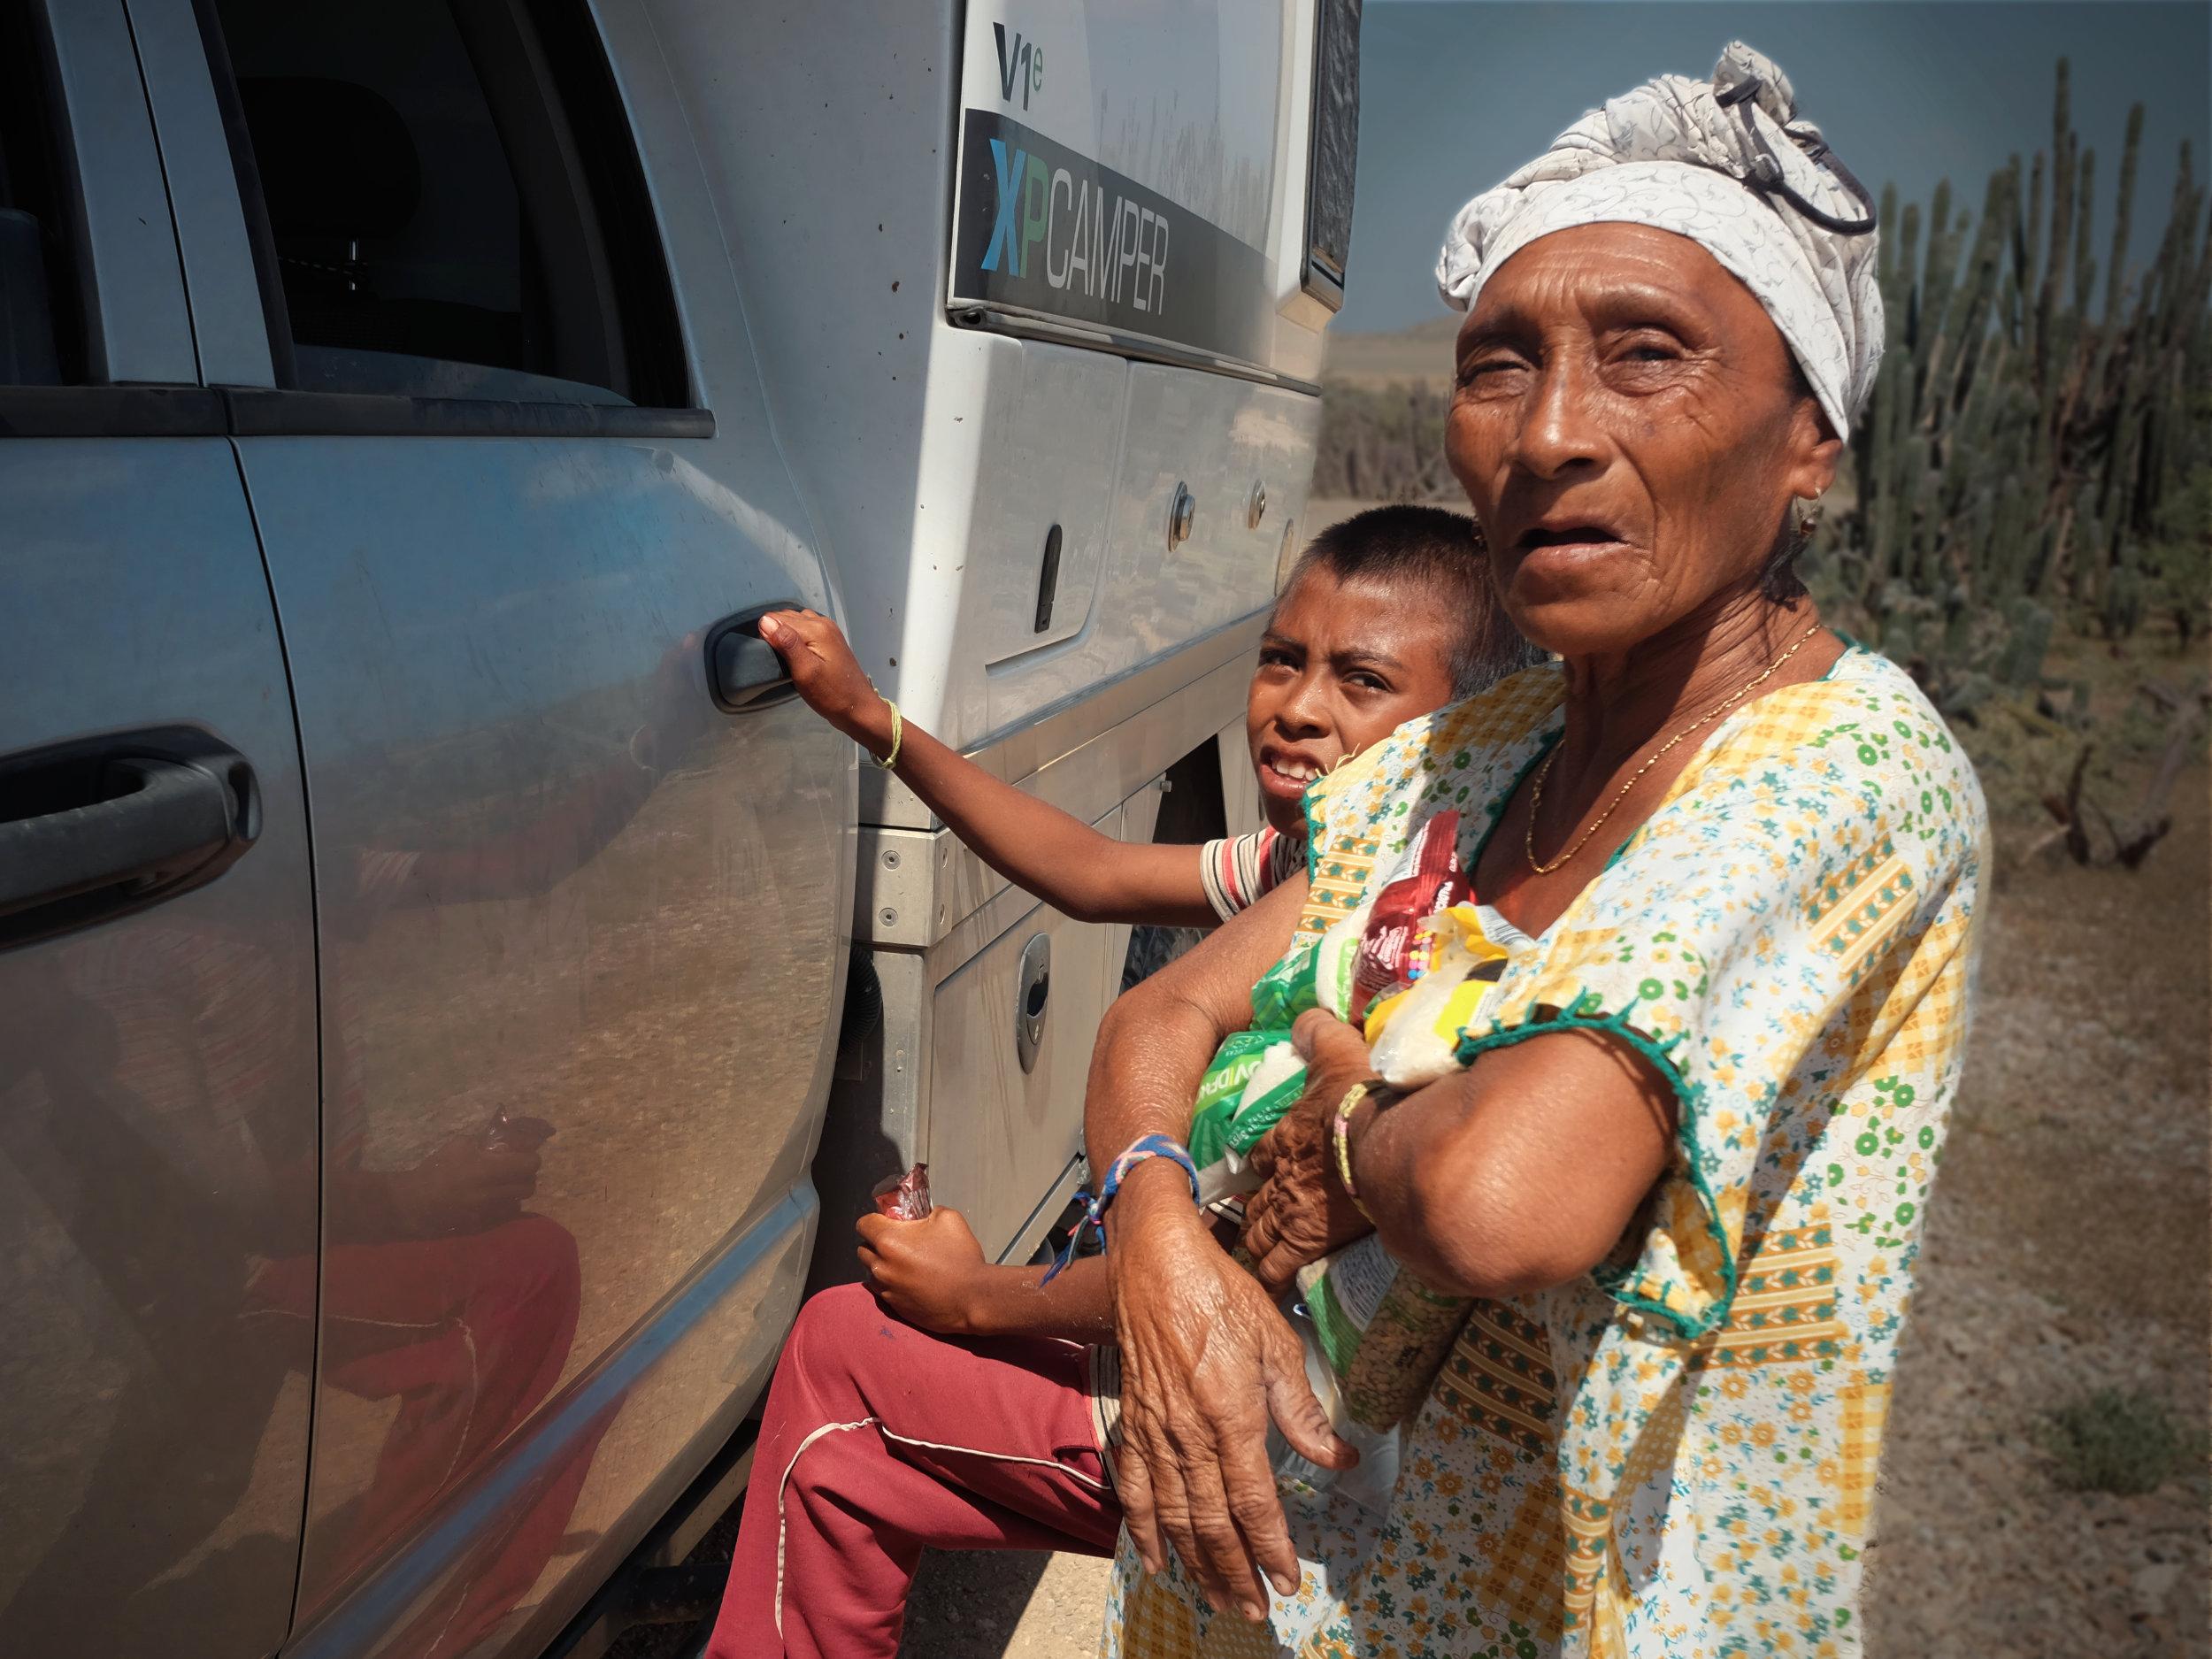 A Wayuu lady holding some donated food